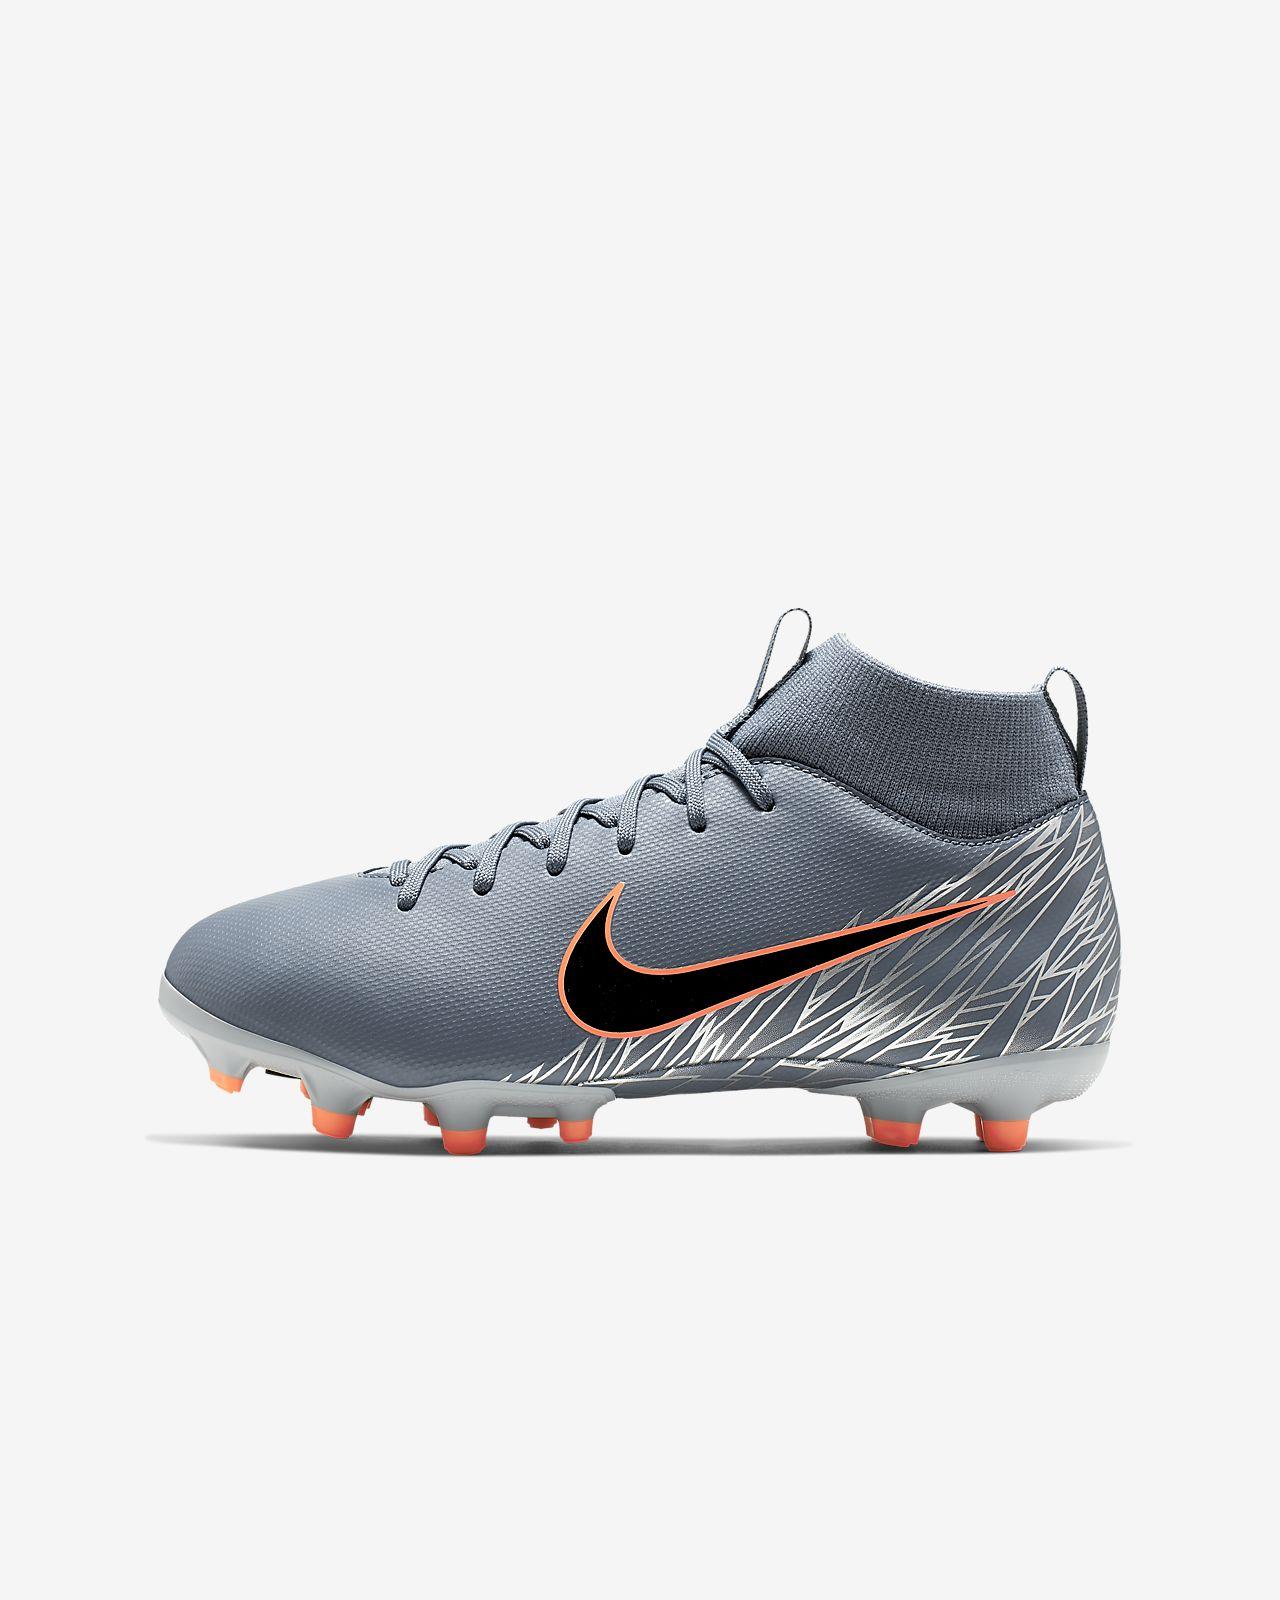 timeless design 61bb4 2115a ... Scarpa da calcio multiterreno Nike Jr. Superfly 6 Academy MG -  Bambini/Ragazzi